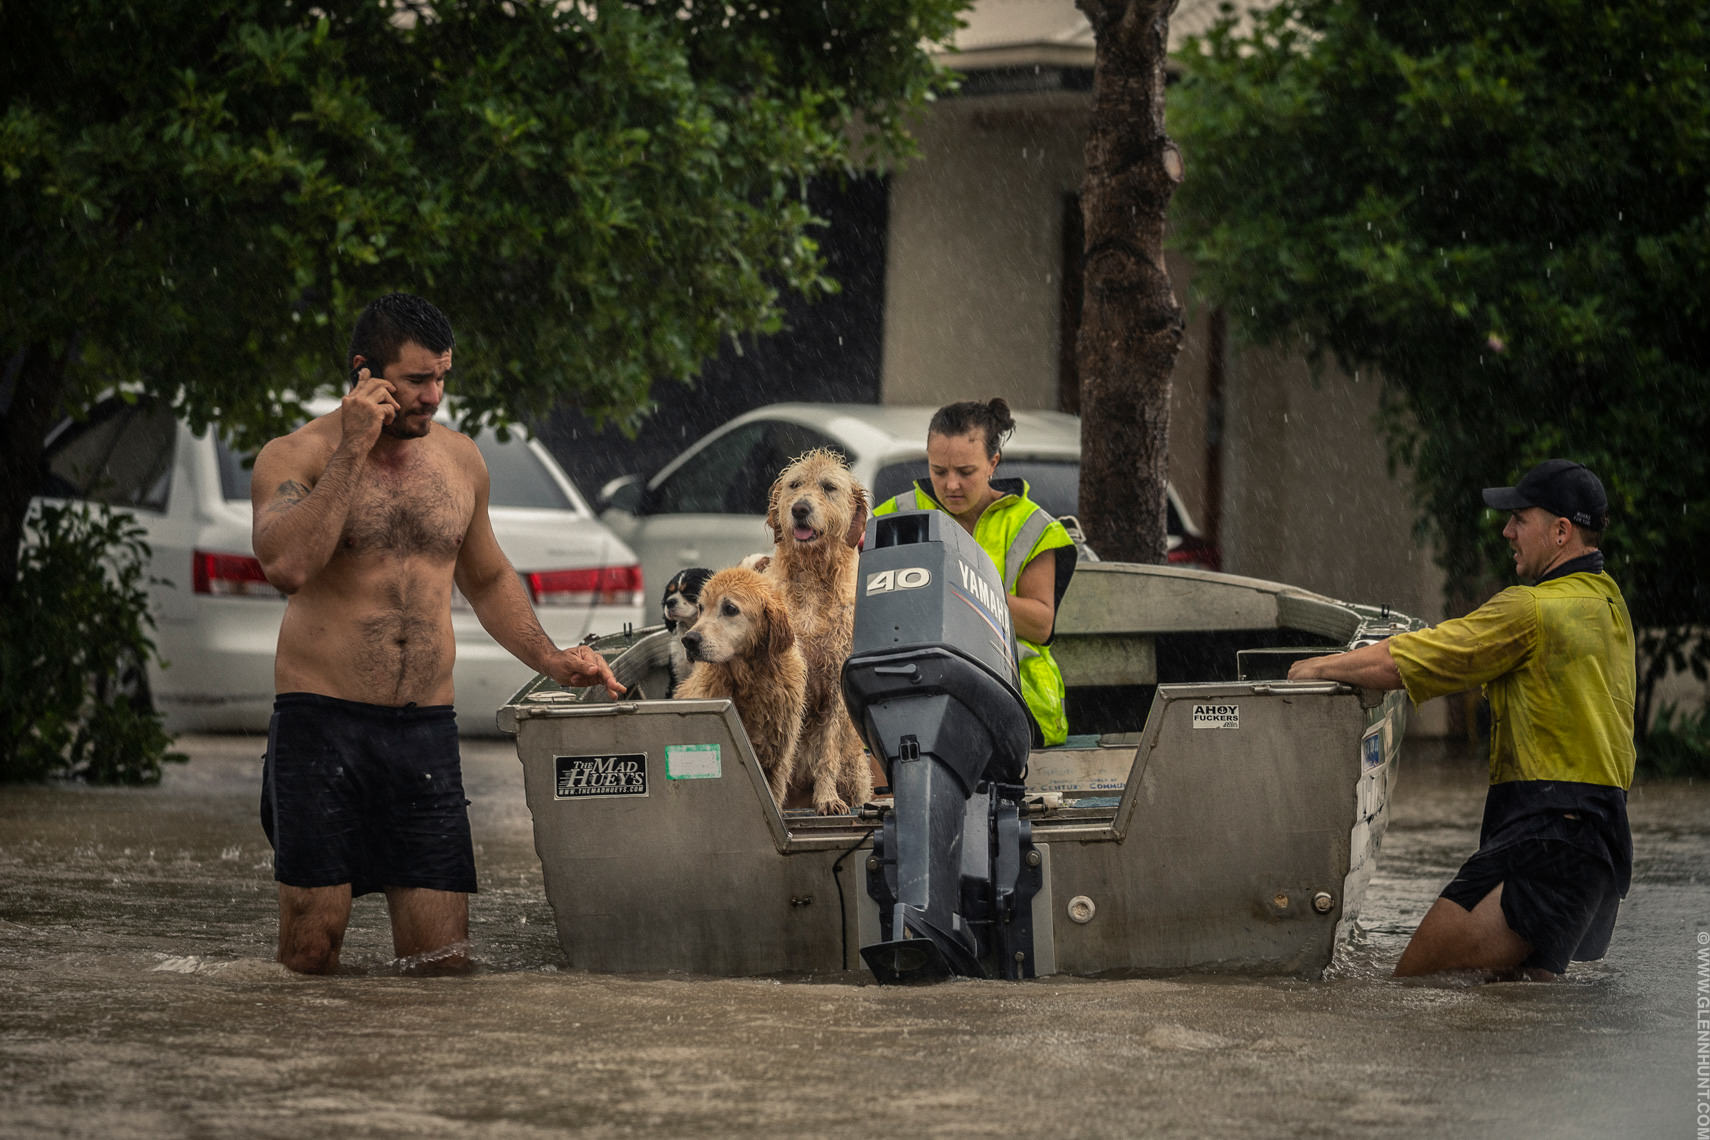 Idalia Flooding